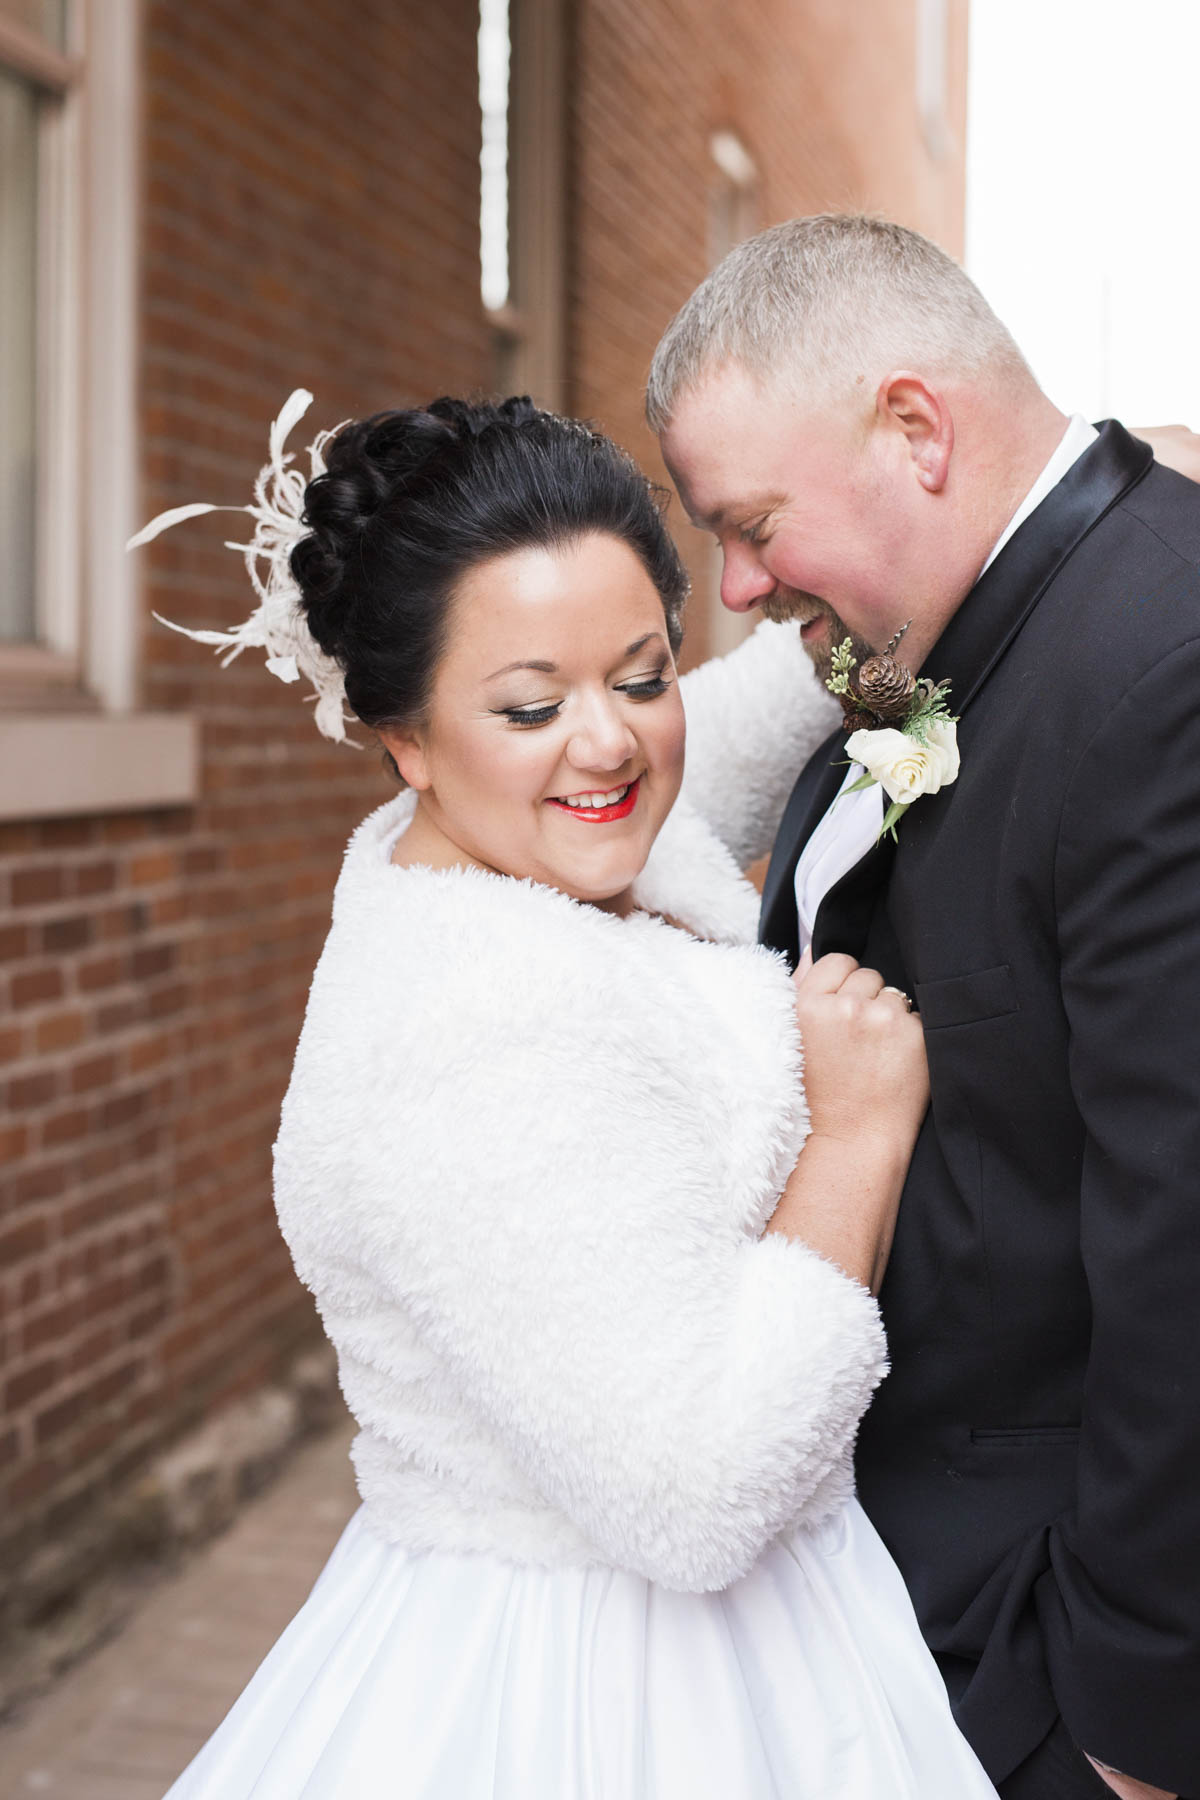 shotbychelsea_wedding_photography_blog-1.jpg